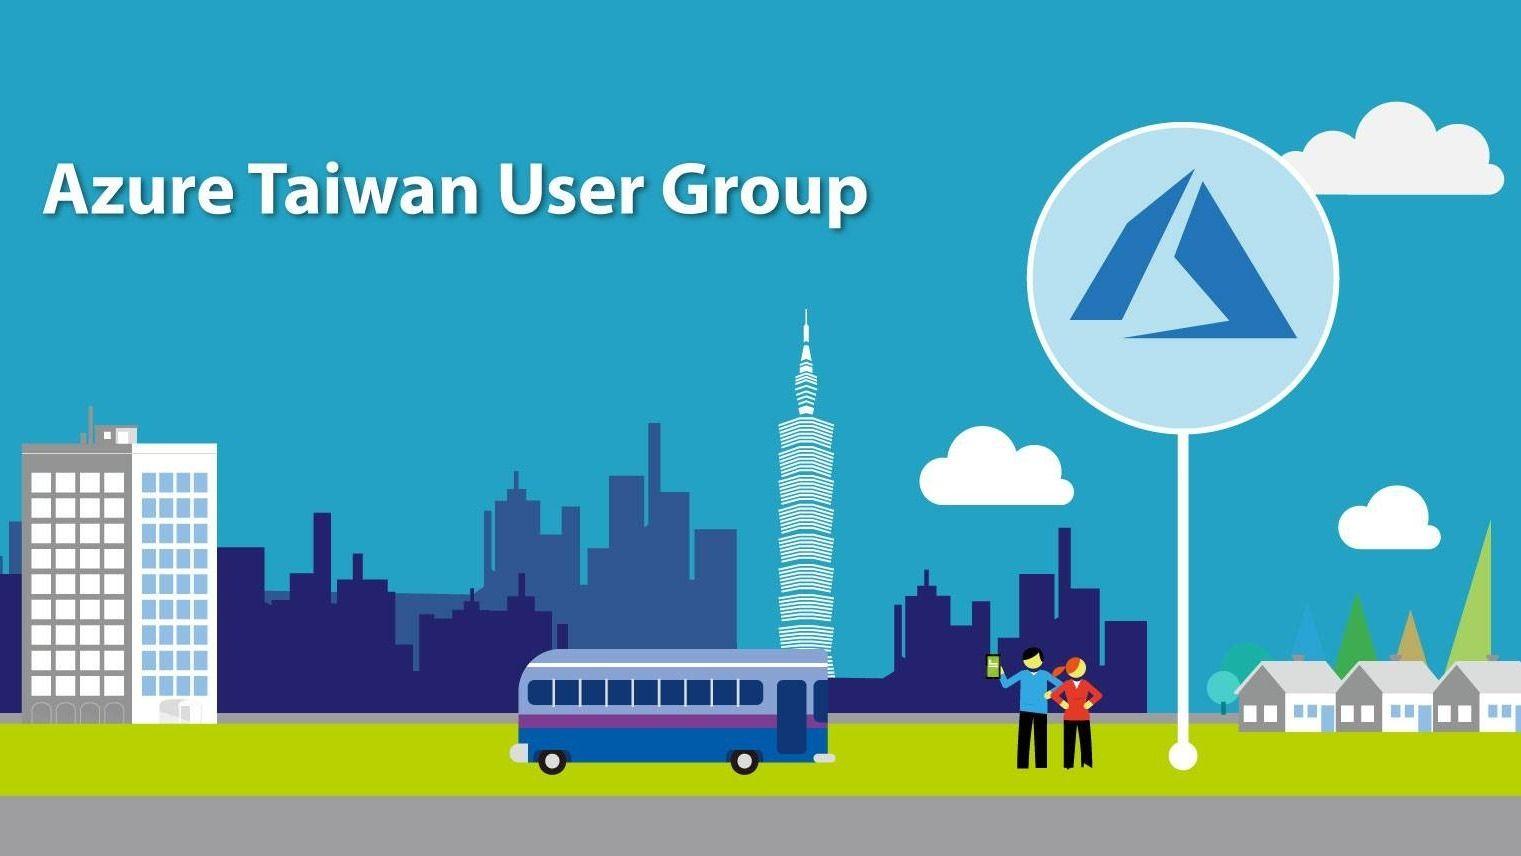 Azure Taiwan